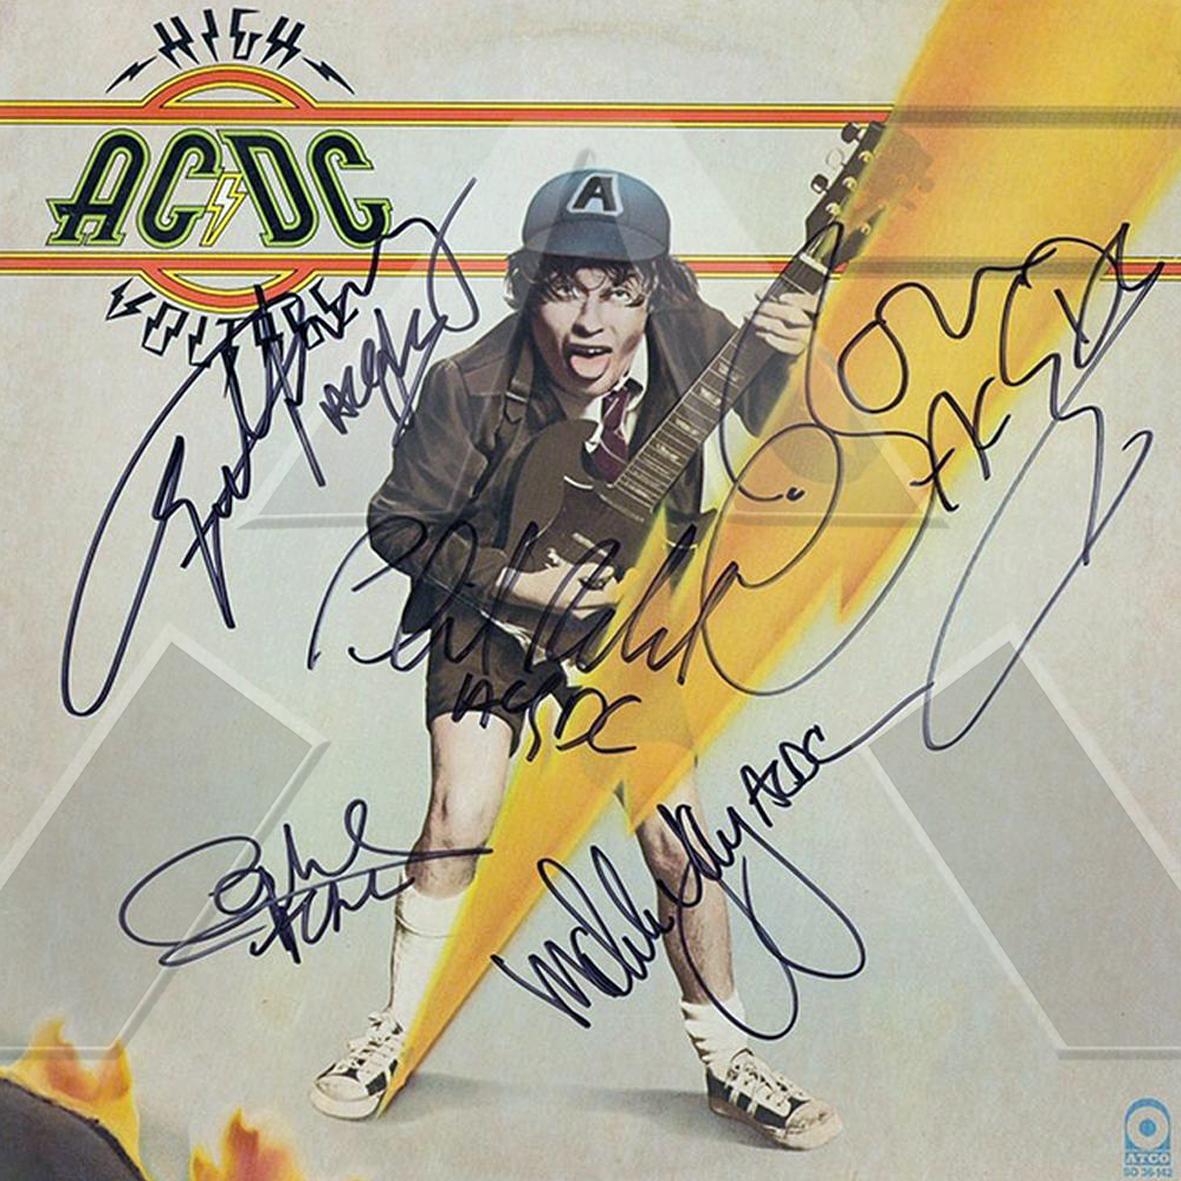 AC/DC ★ High Voltage (vinyl album EU signed)